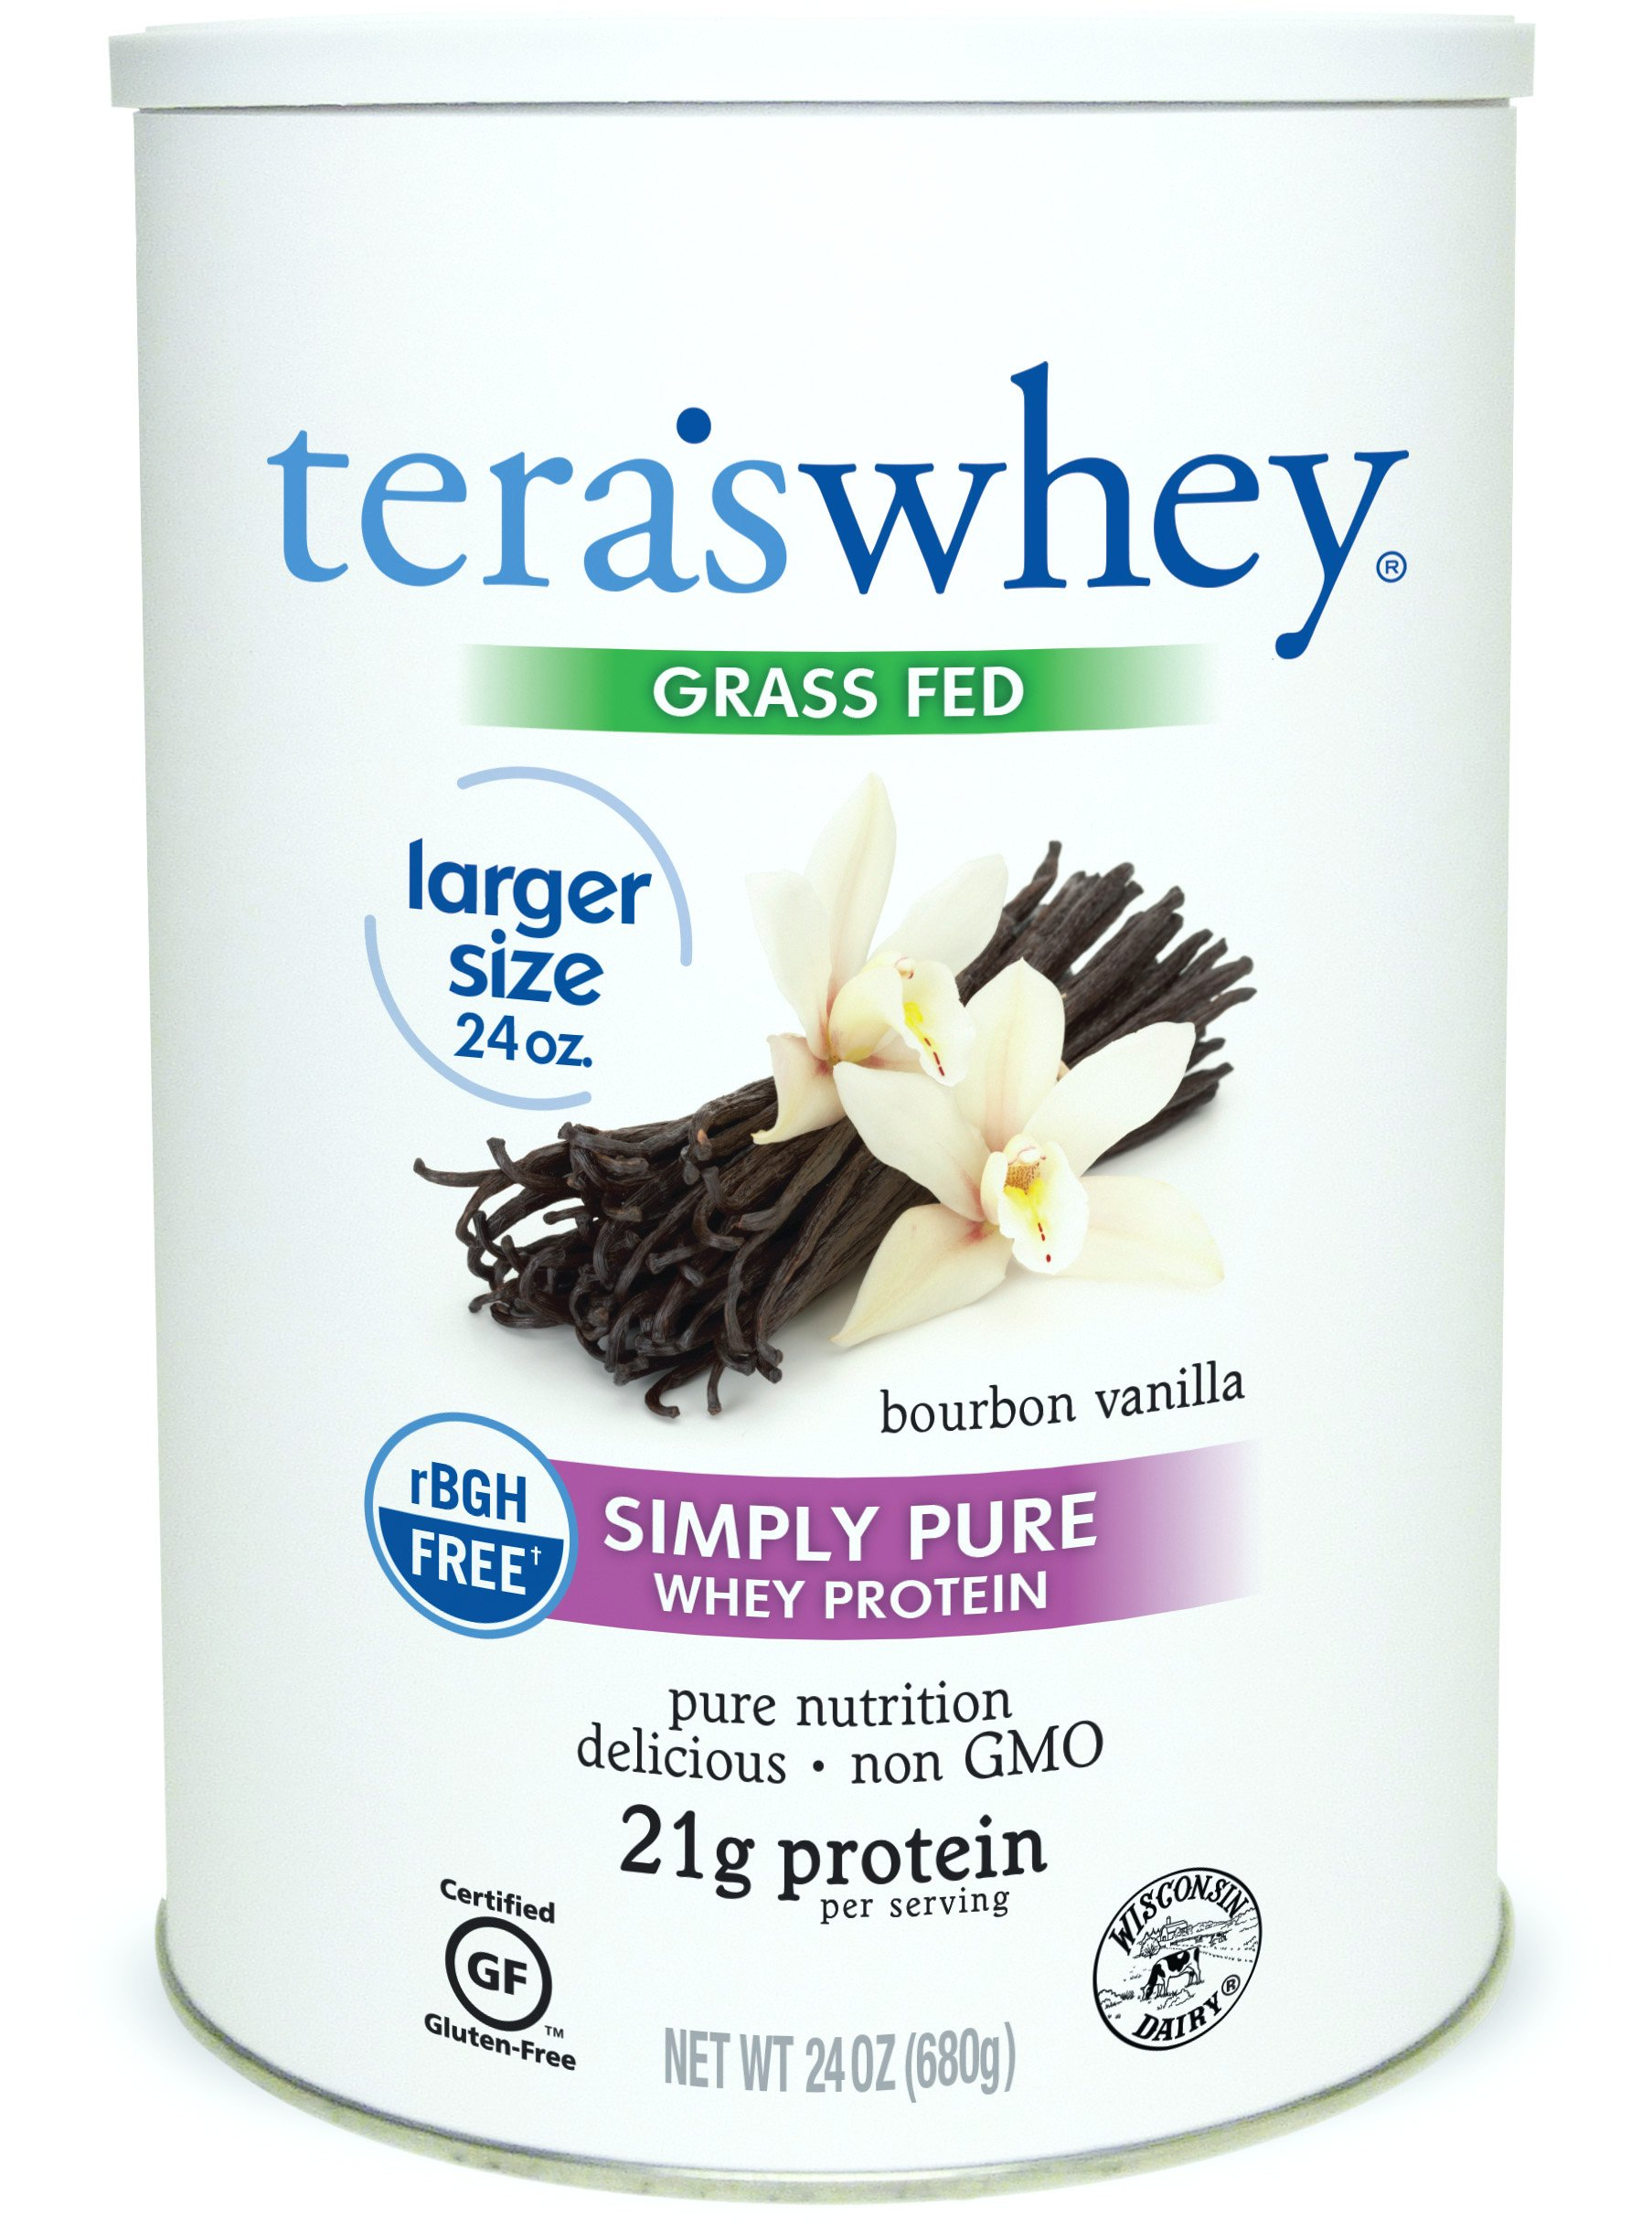 Teraswhey Simply Pure Whey Protein, Bourbon Vanilla, 24 oz by teraswhey